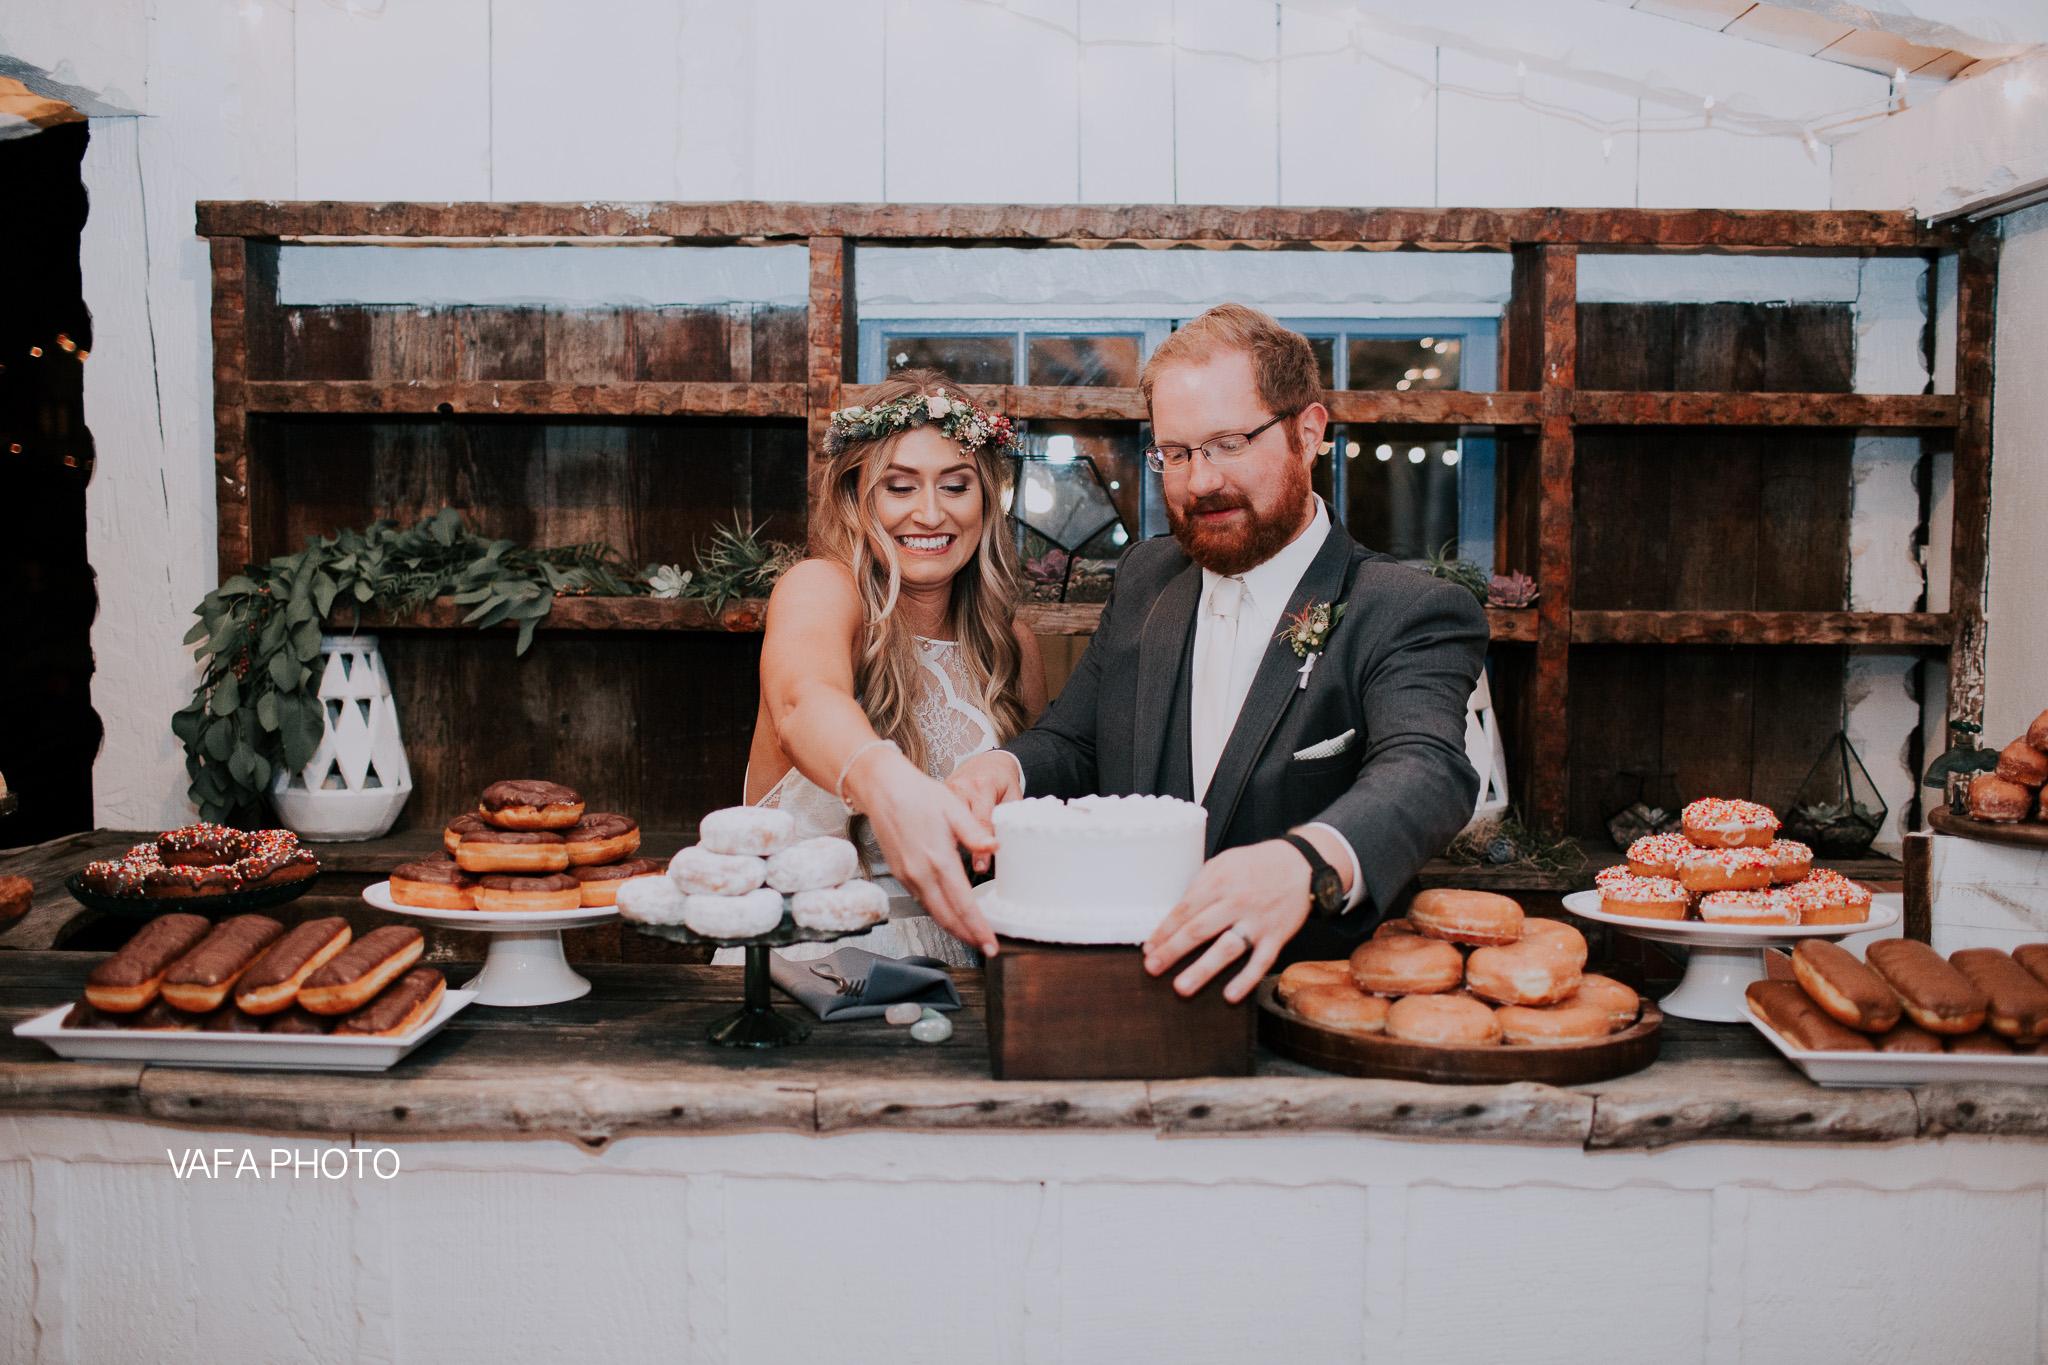 Leo-Carrillo-Ranch-Wedding-Lauren-Mike-Vafa-Photo-1138.jpg